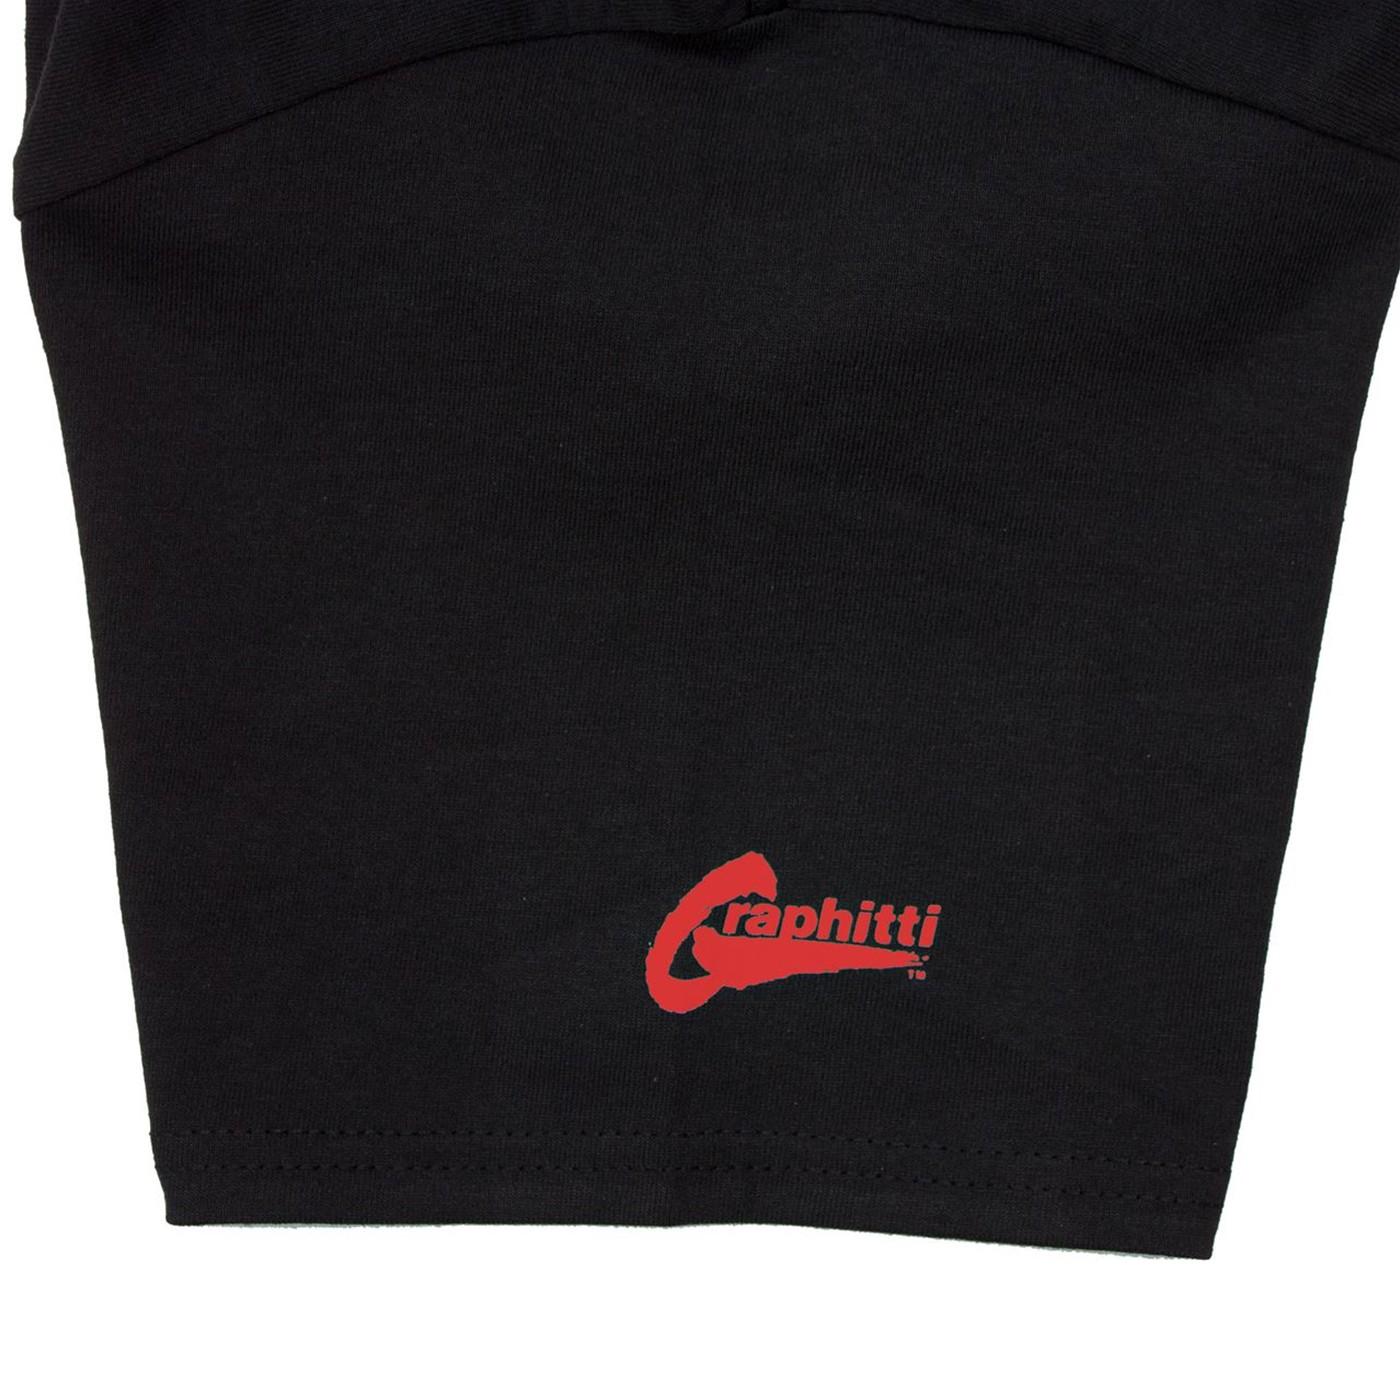 Harley Quinn: Skull Bags T-Shirt by Amanda Conner